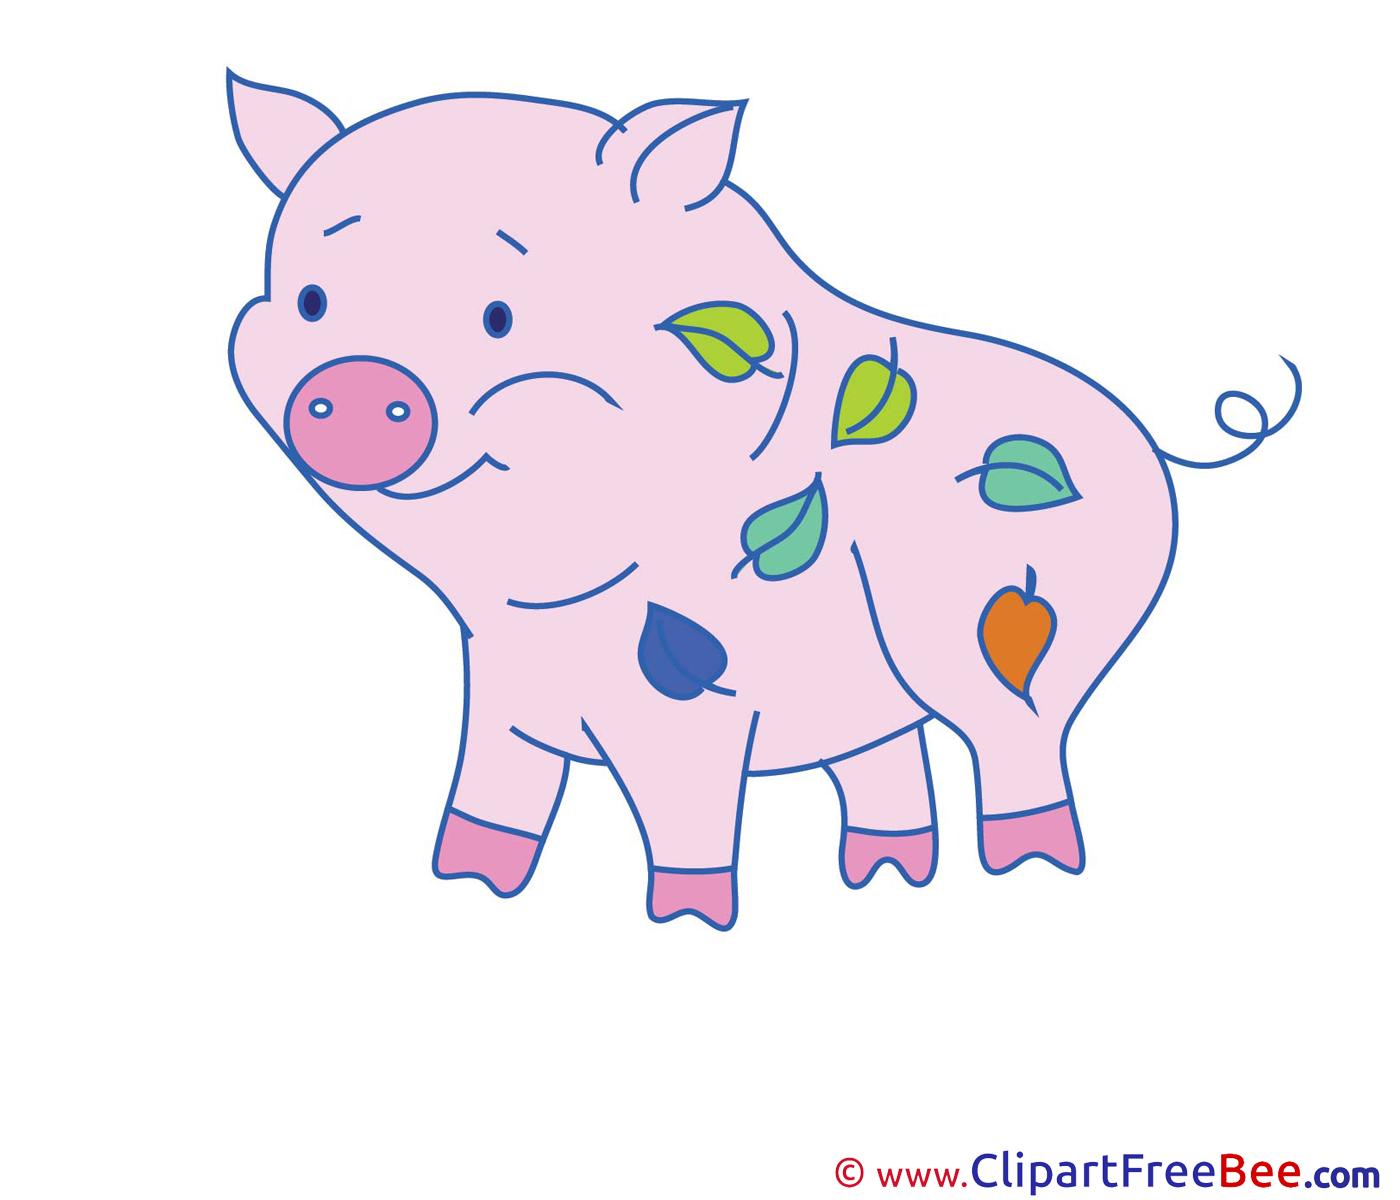 Leaves Pig Pics free download Image